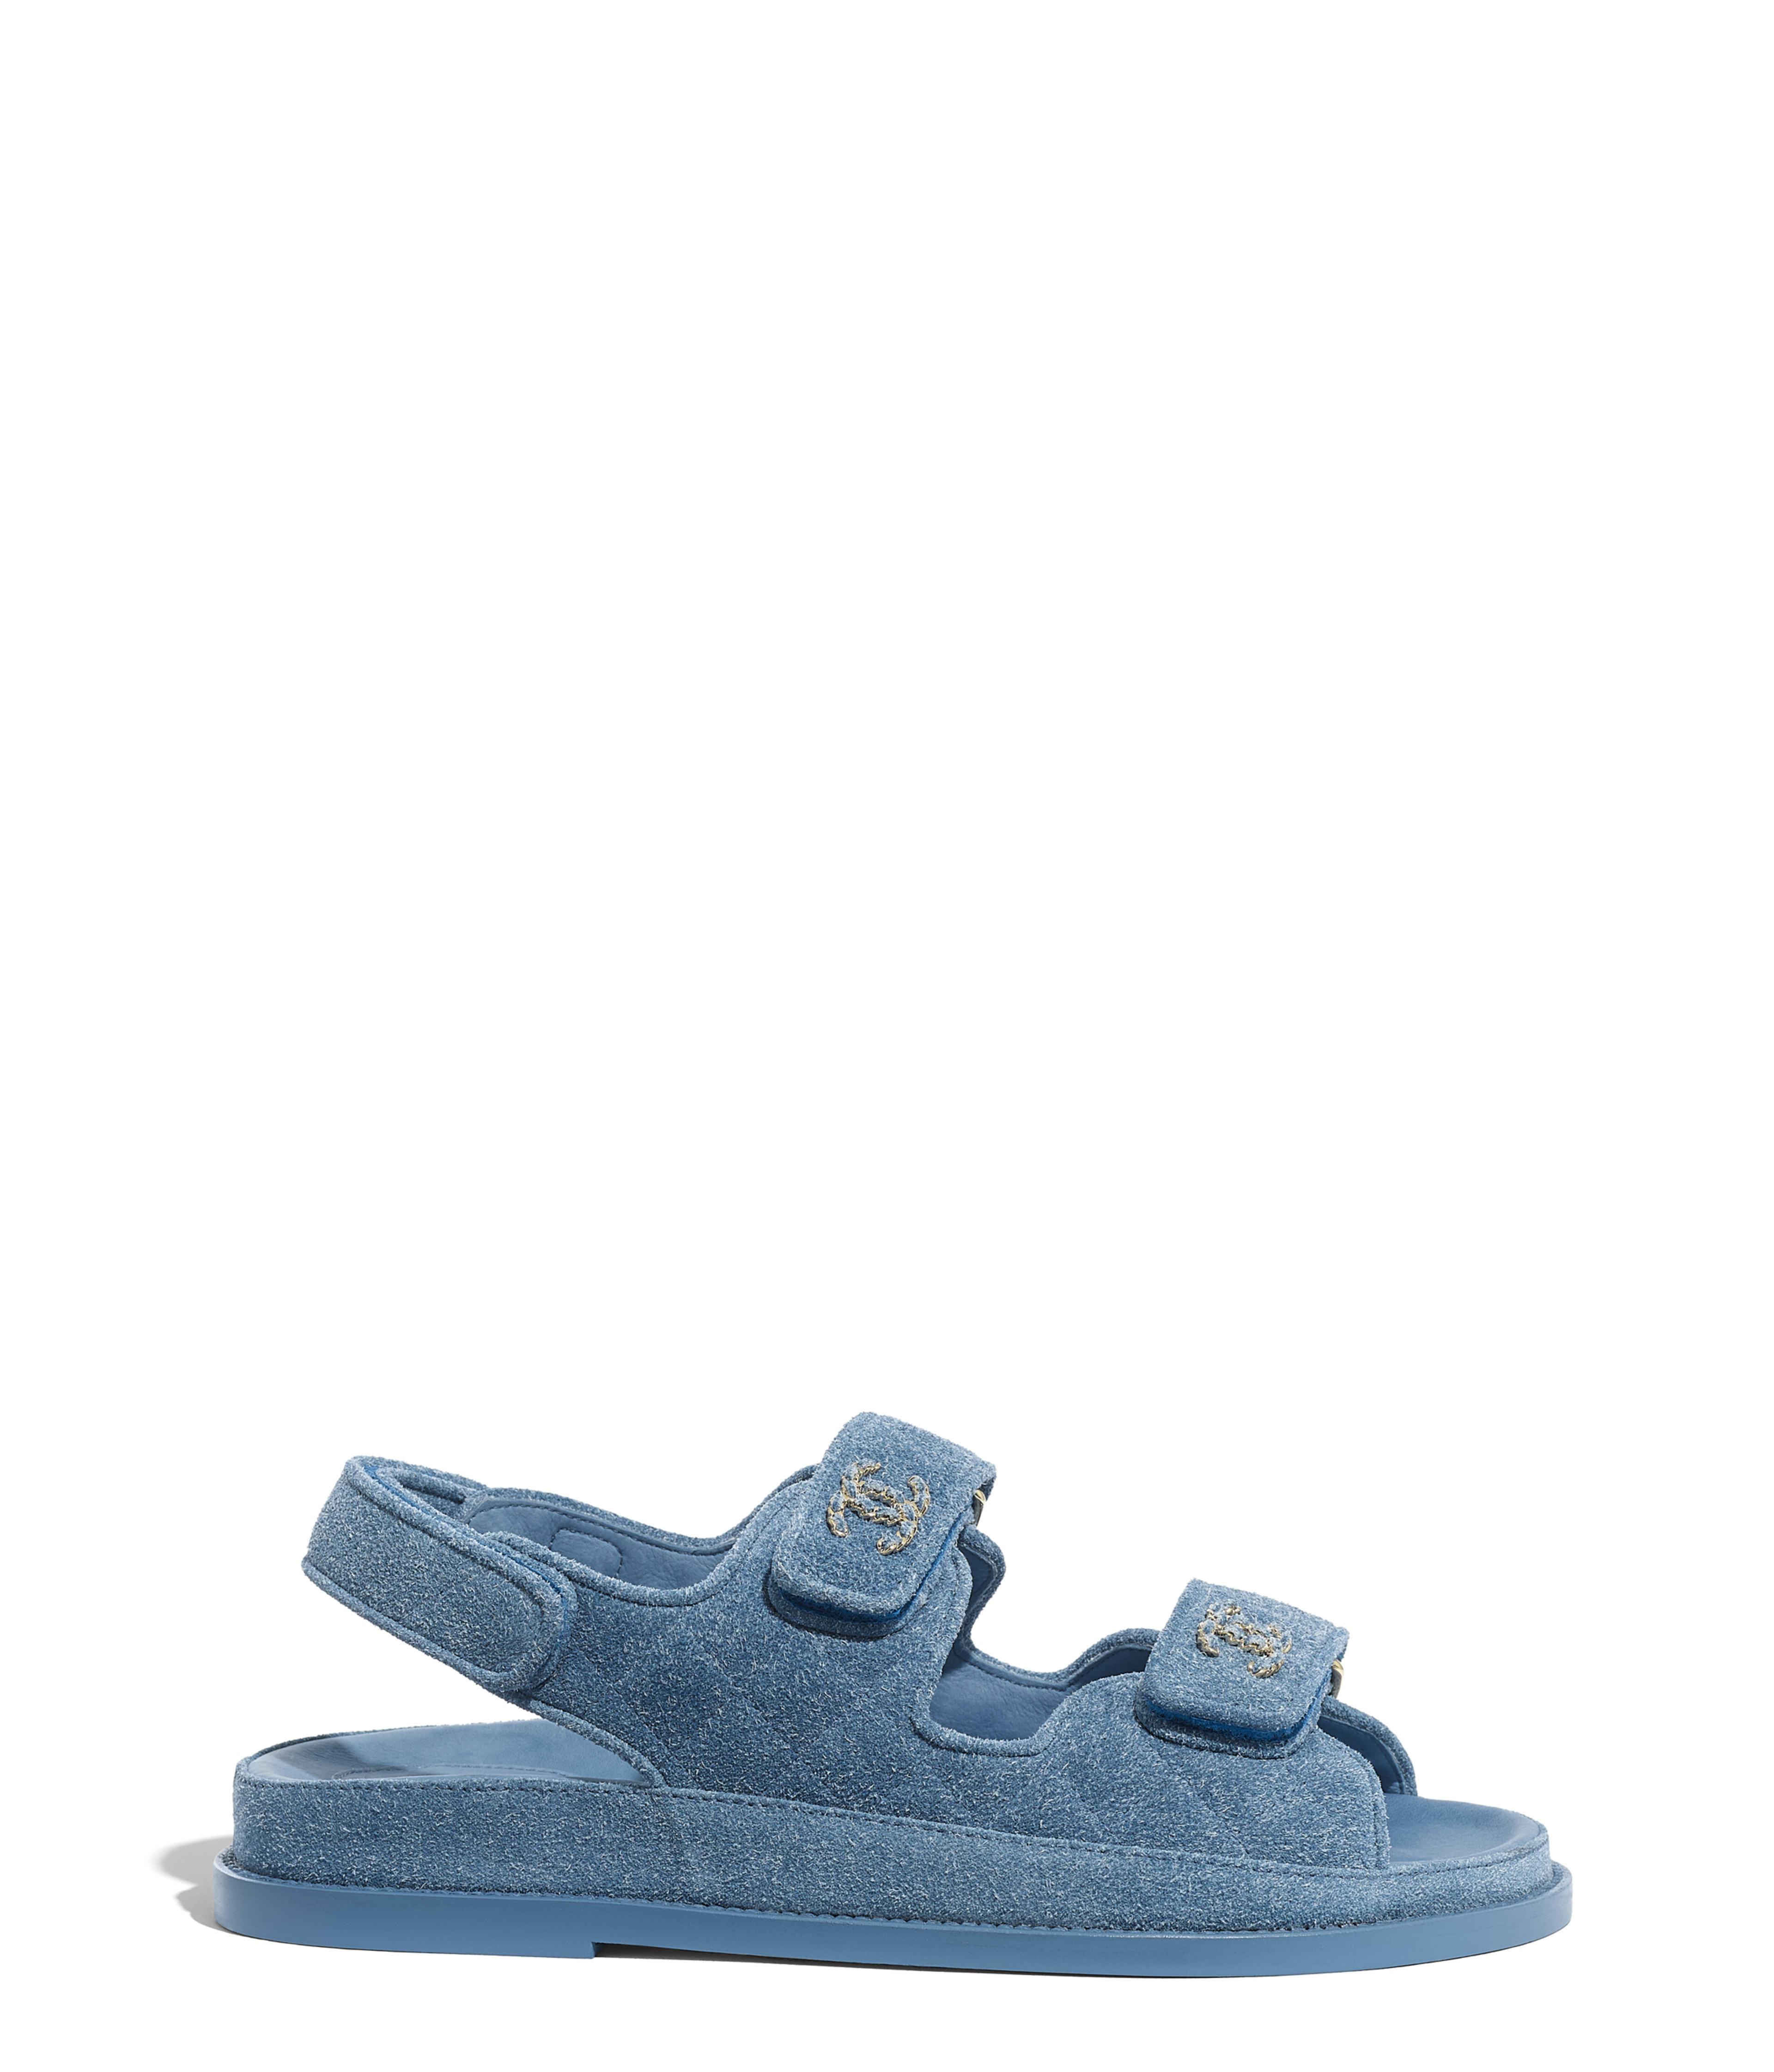 Sandals - Shoes | CHANEL